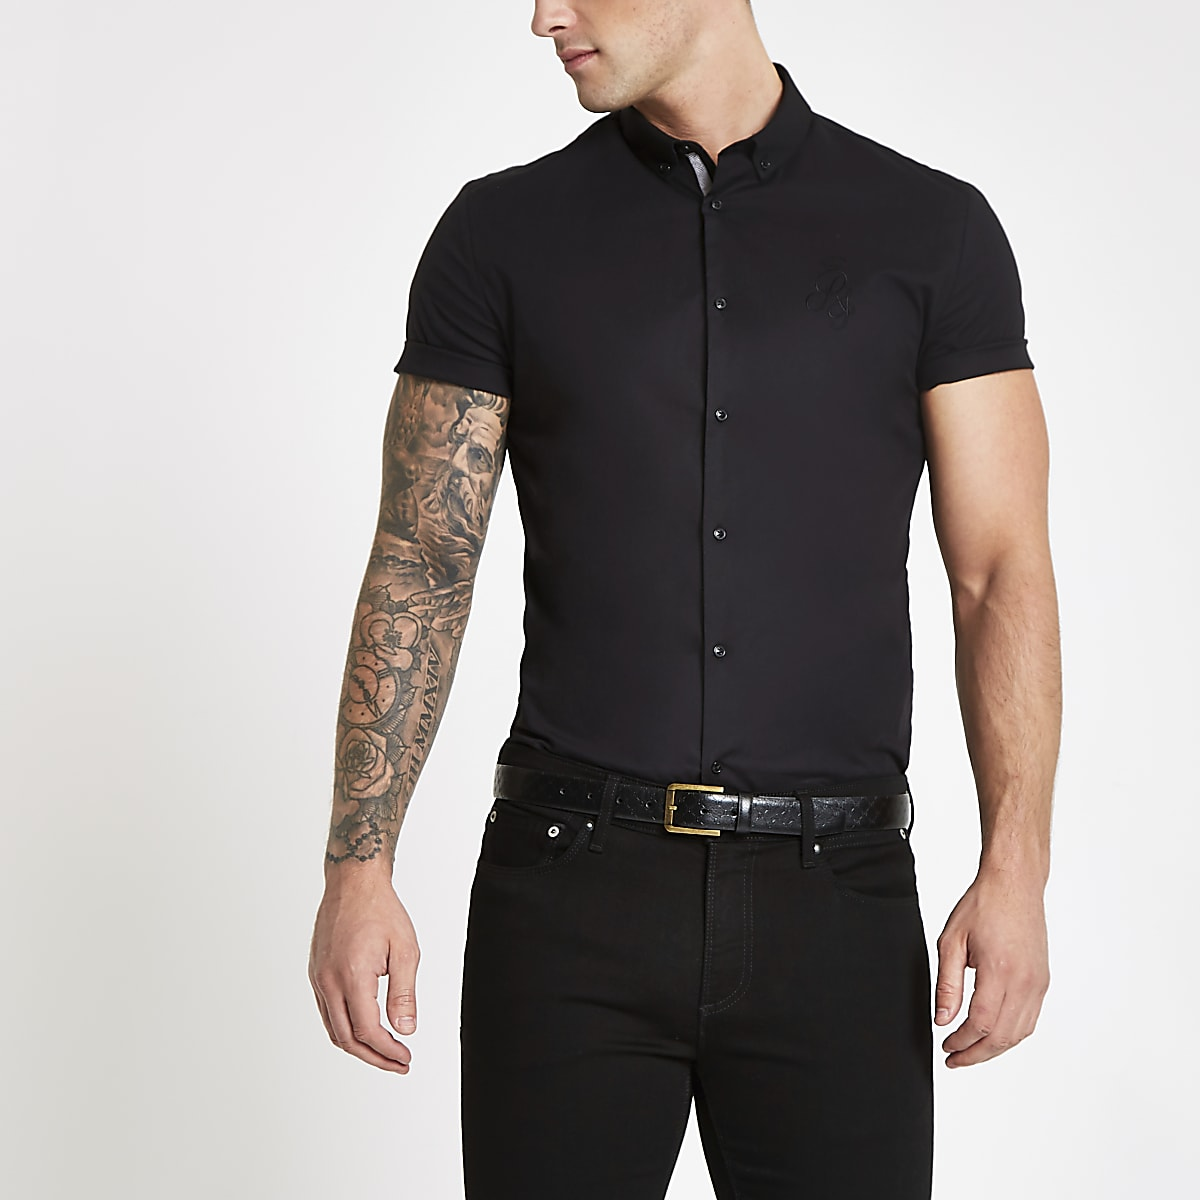 Black poplin muscle fit short sleeve shirt